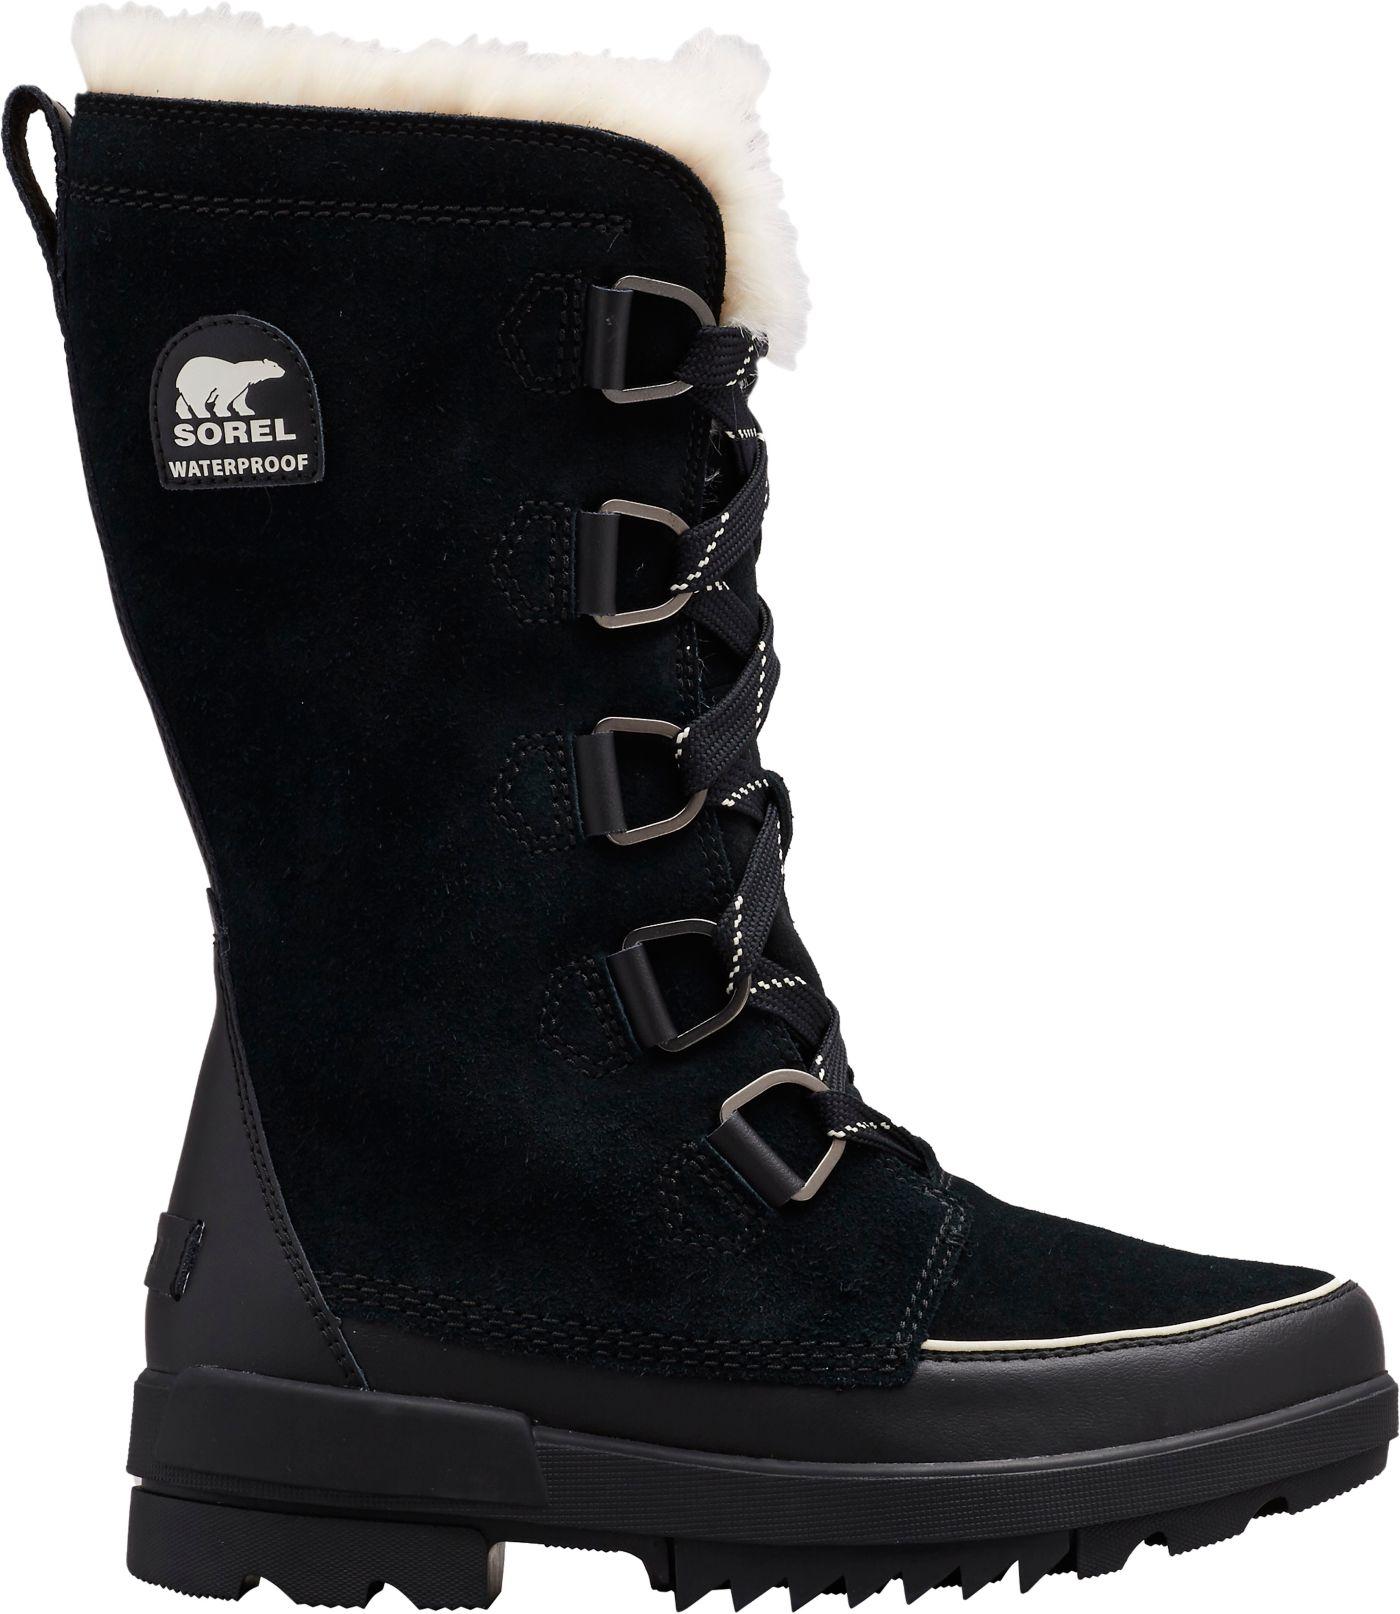 SOREL Women's Tivoli IV Tall 100g Waterproof Winter Boots